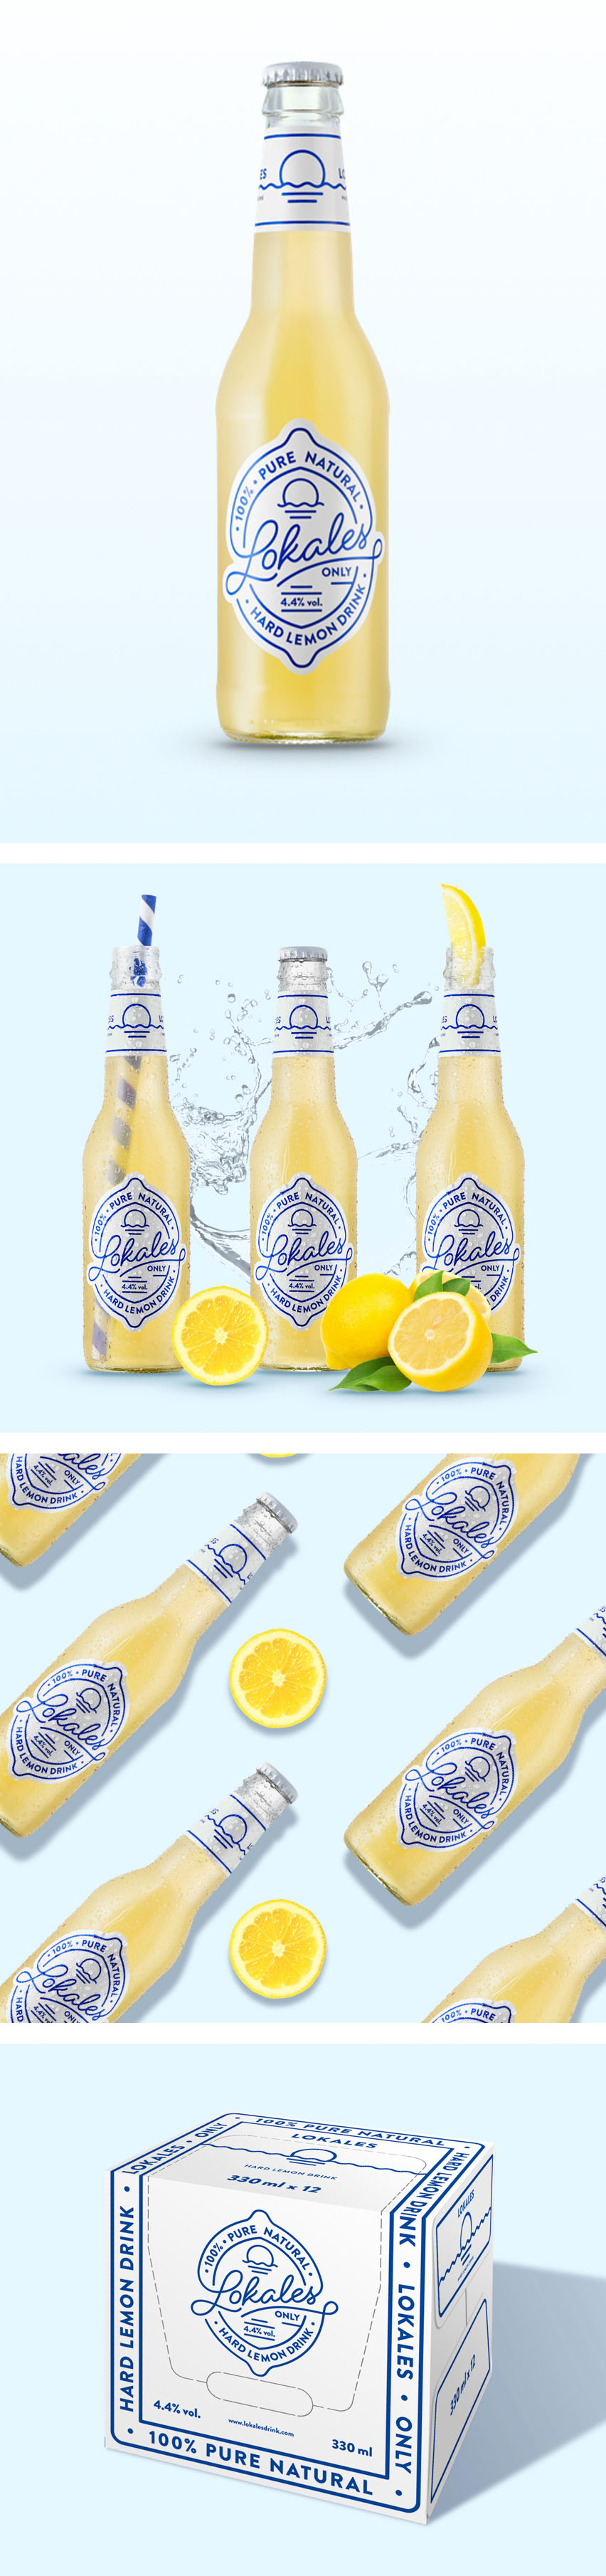 Lokales Fresh packaging design at Förpackad